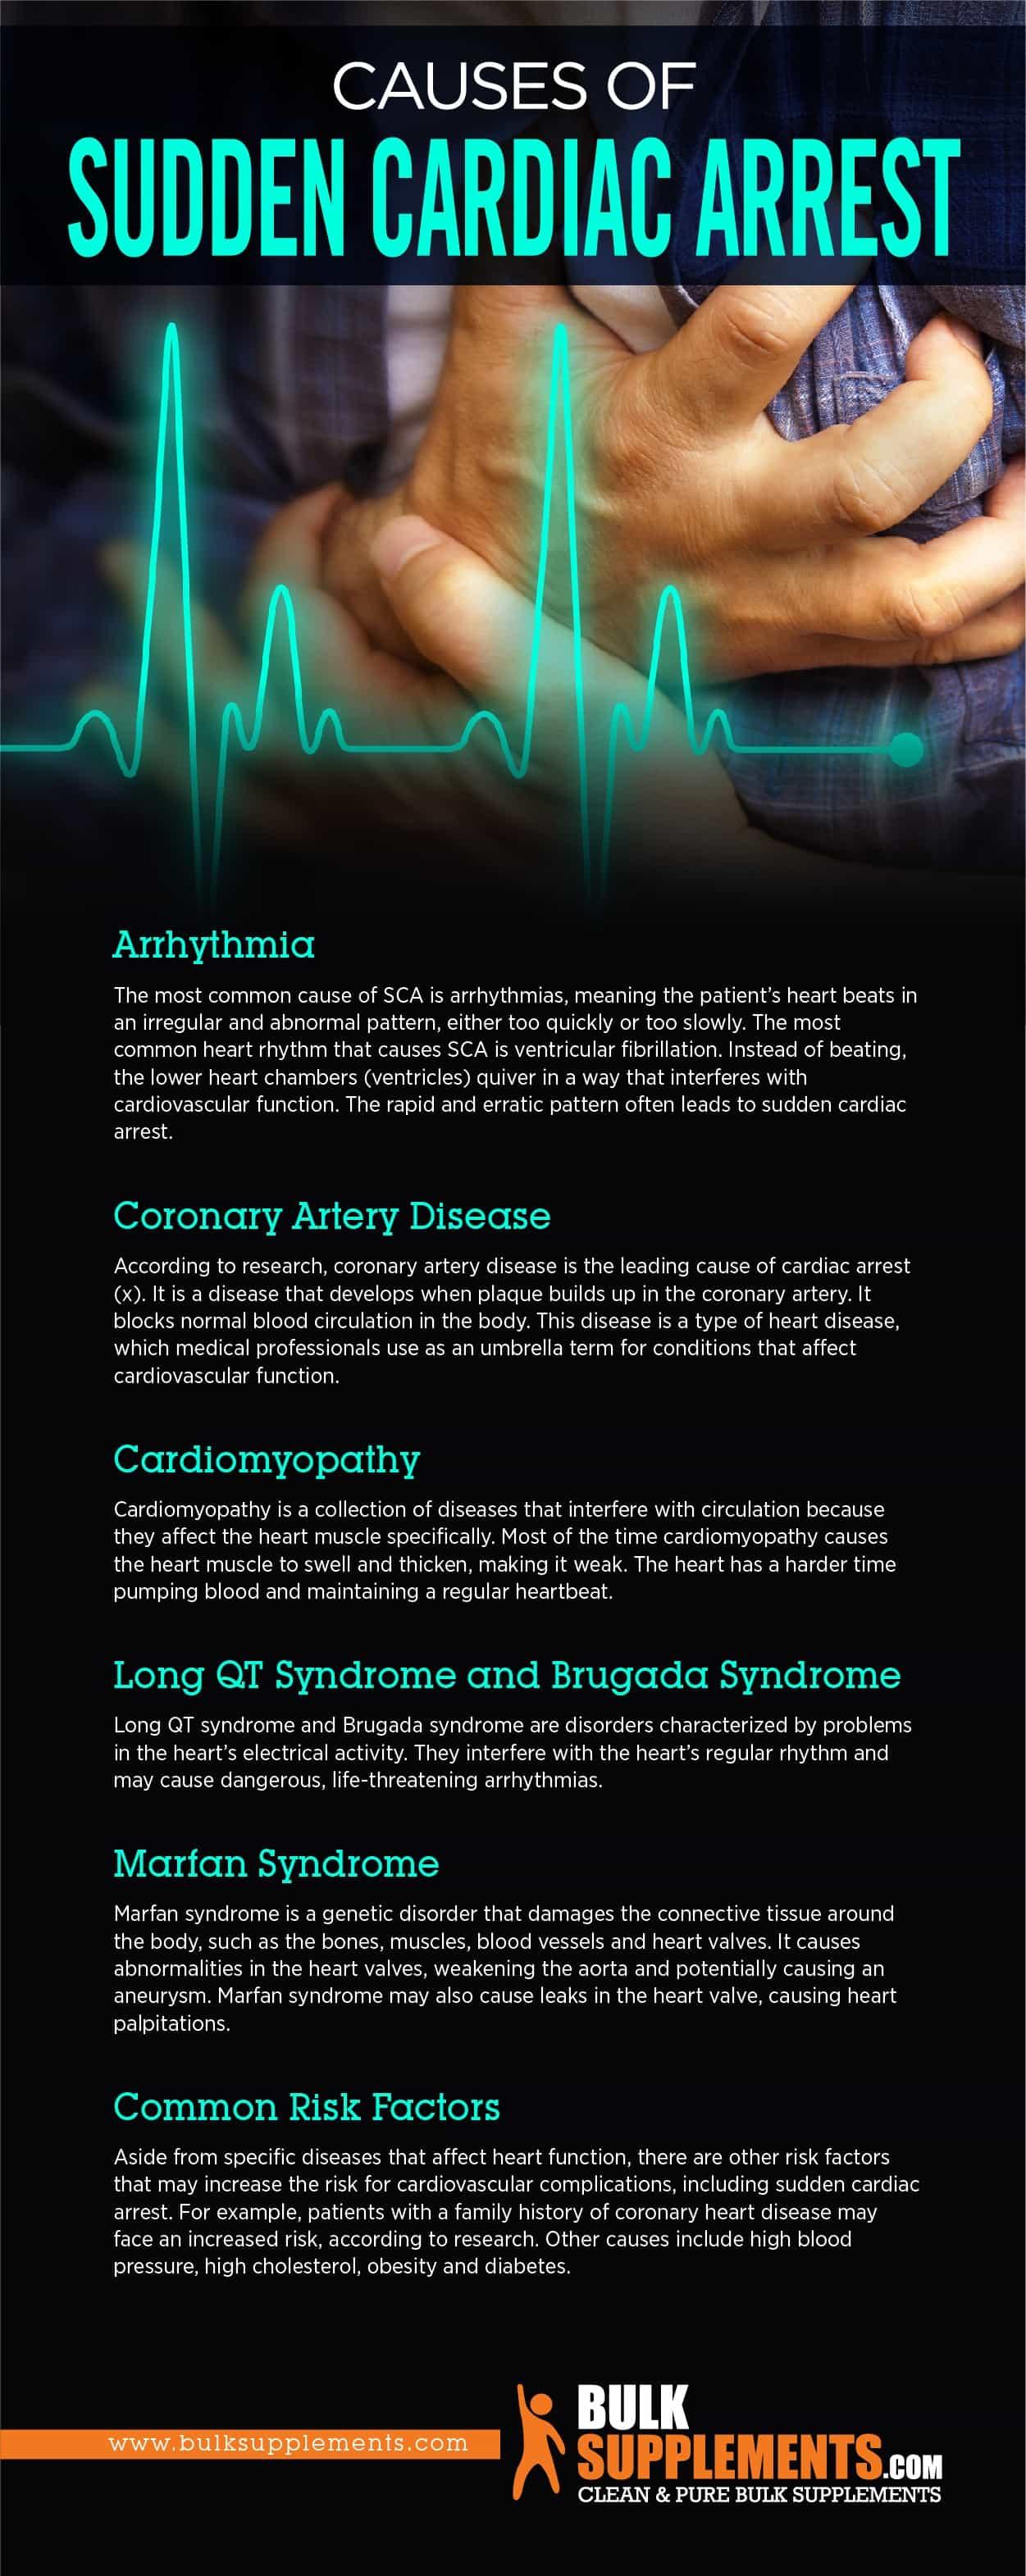 Causes of Sudden Cardiac Arrest